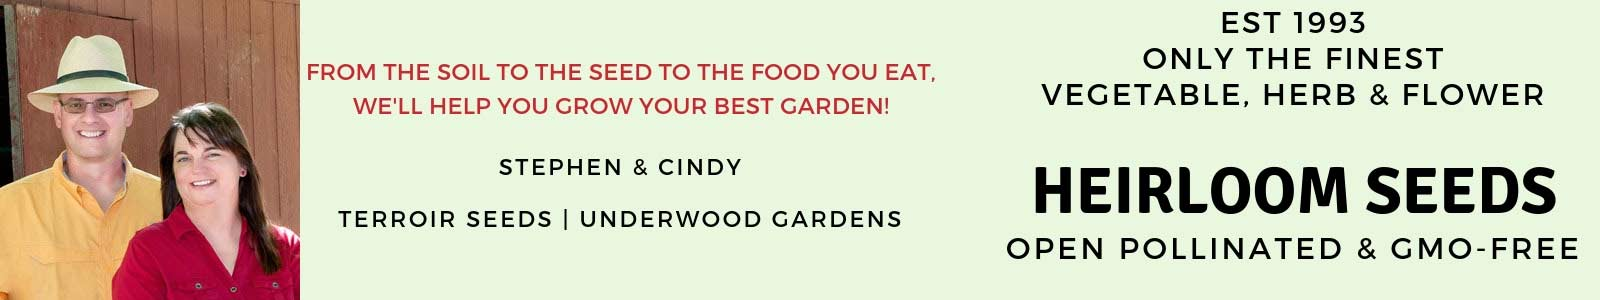 Heirloom vegetable, herb, and flower garden seeds.